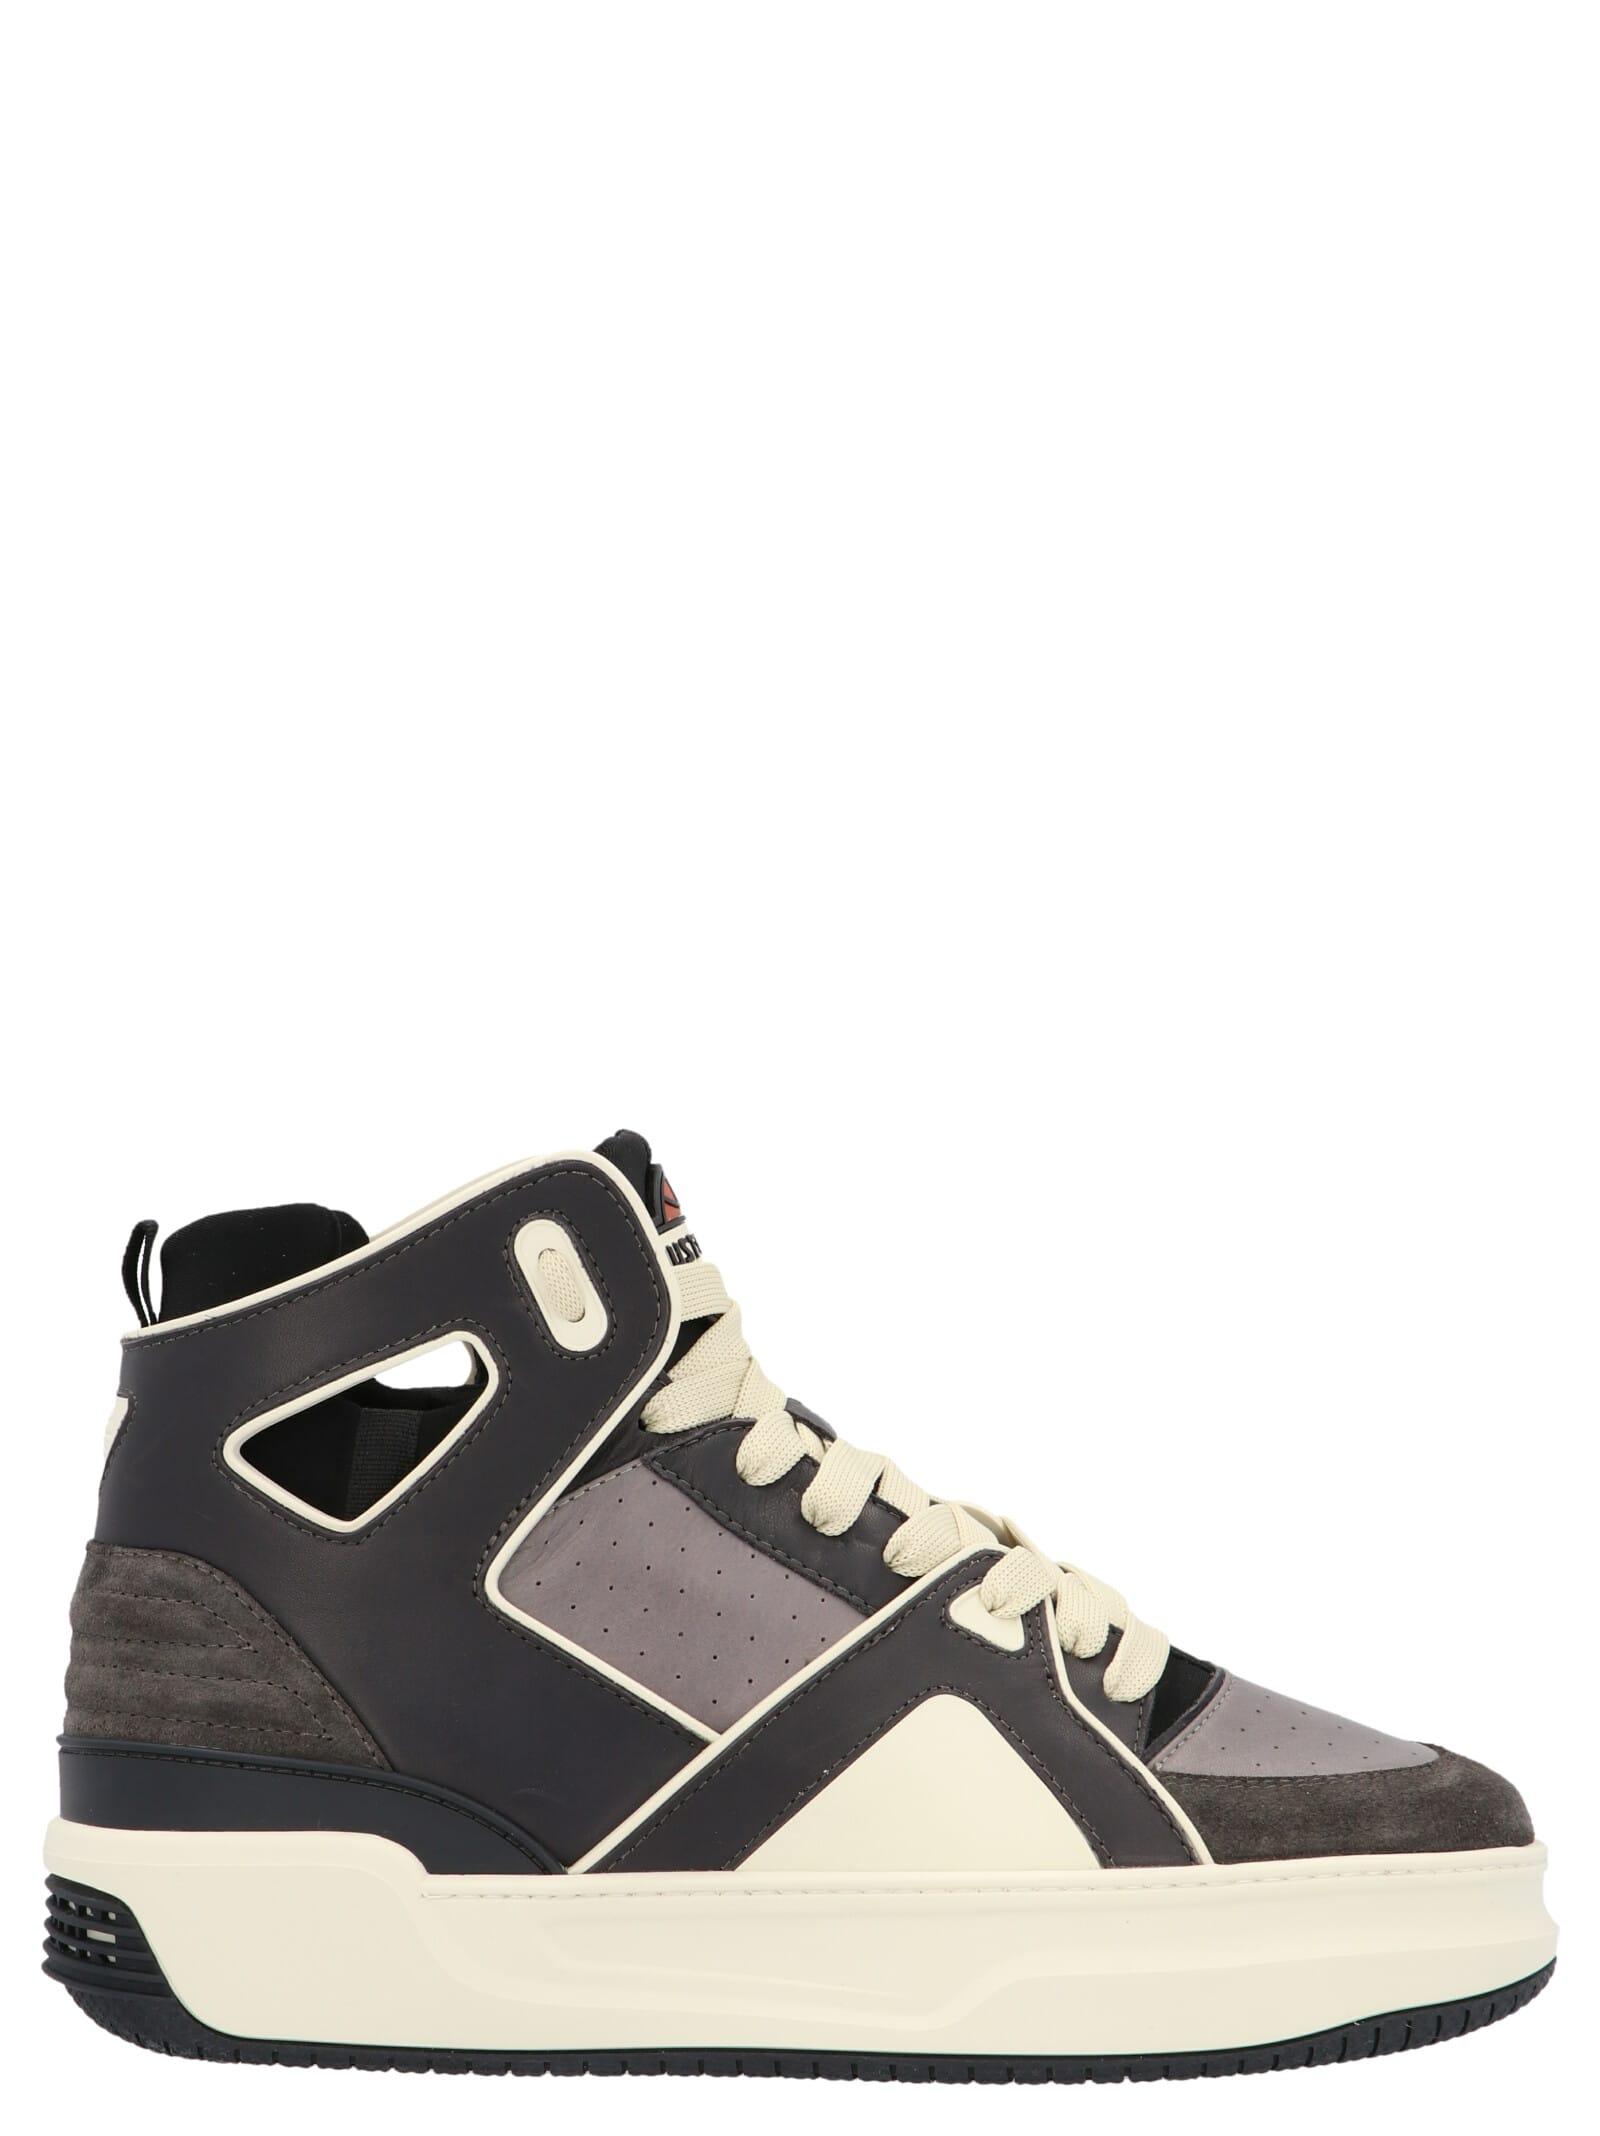 jd1 Shoes